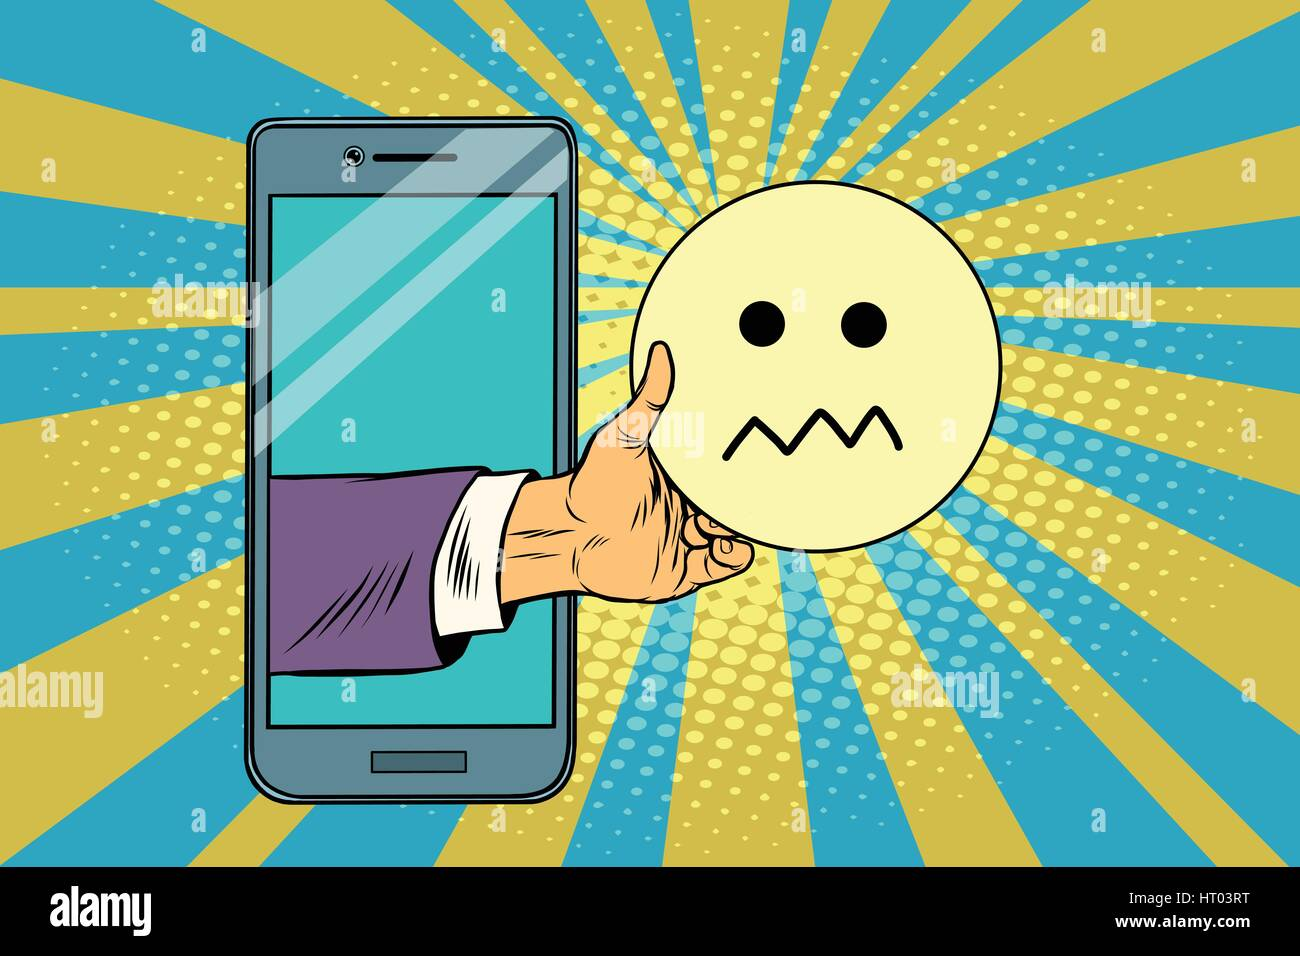 skepticism emoji emoticons in smartphone - Stock Image